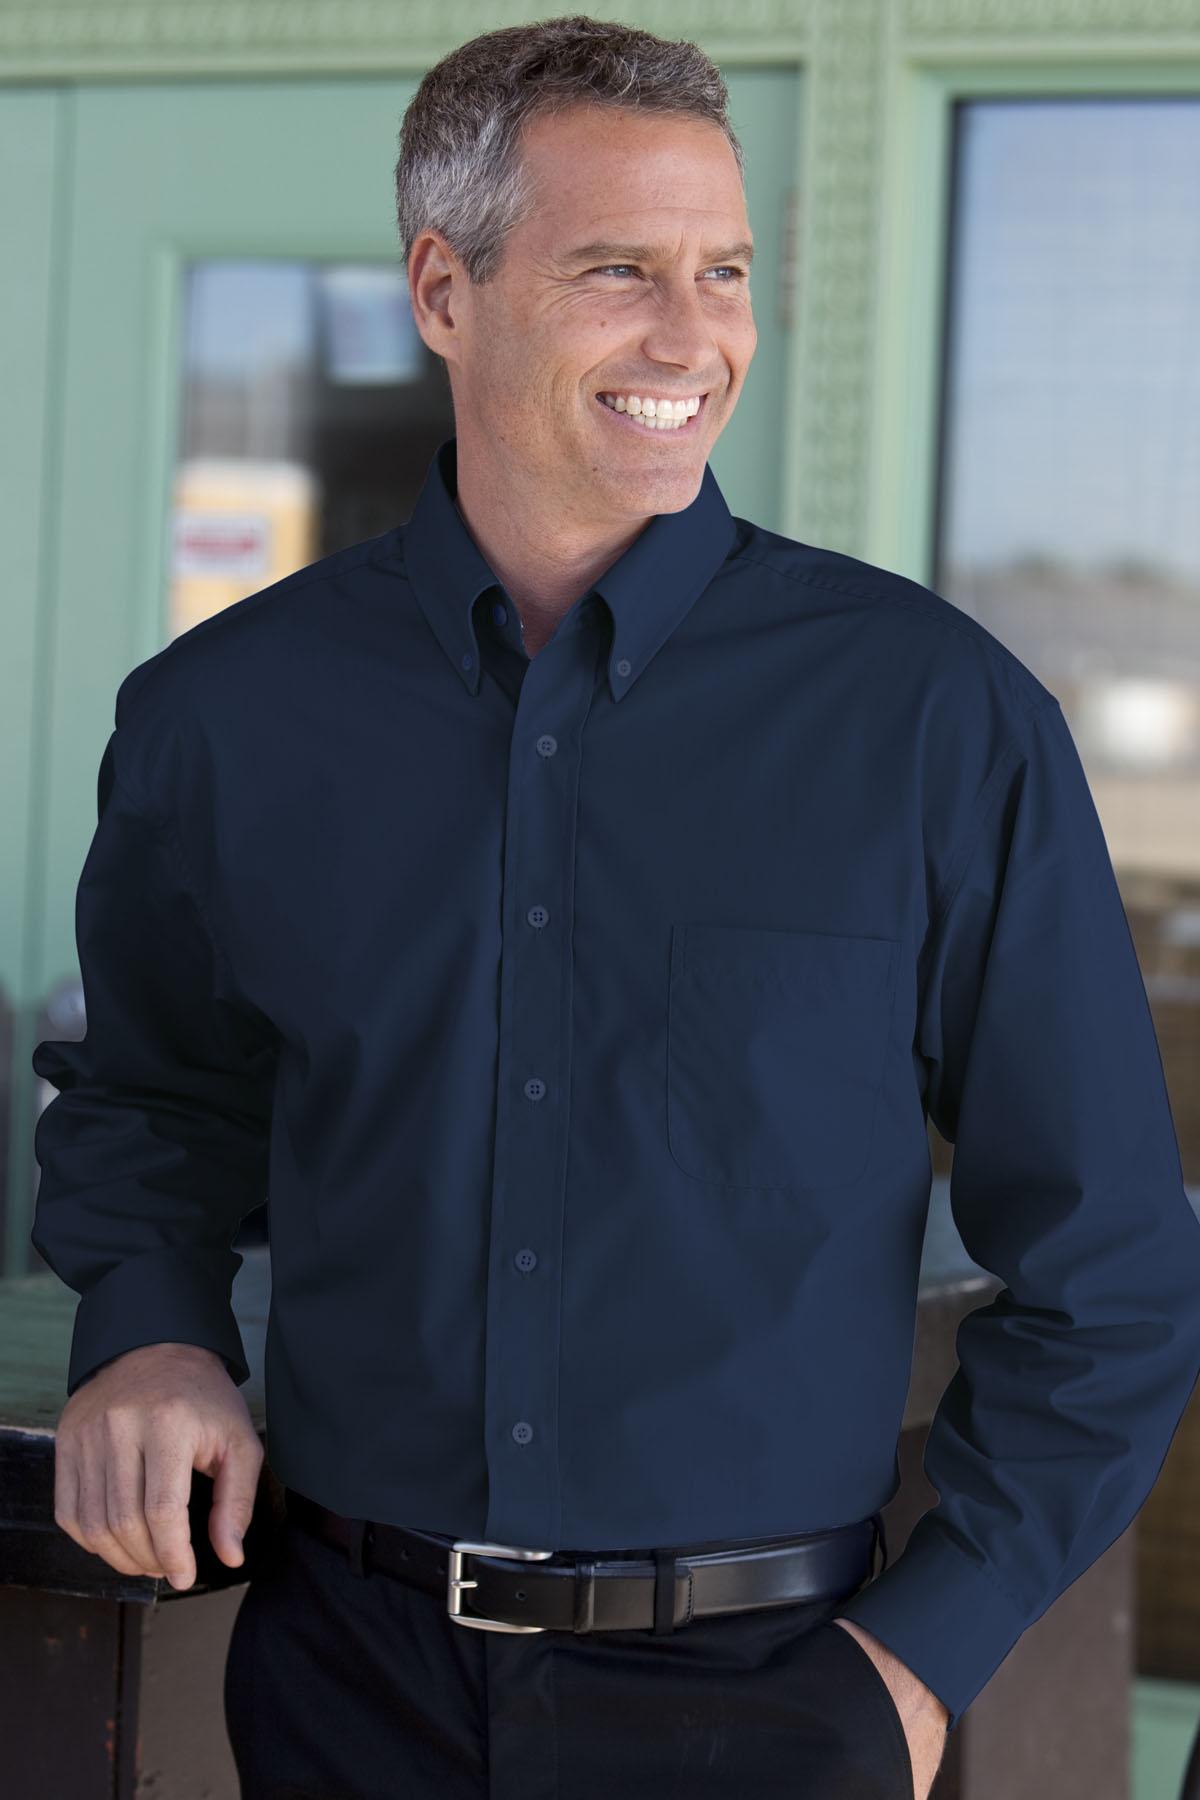 Vantage 1100 - Blended Poplin Shirt